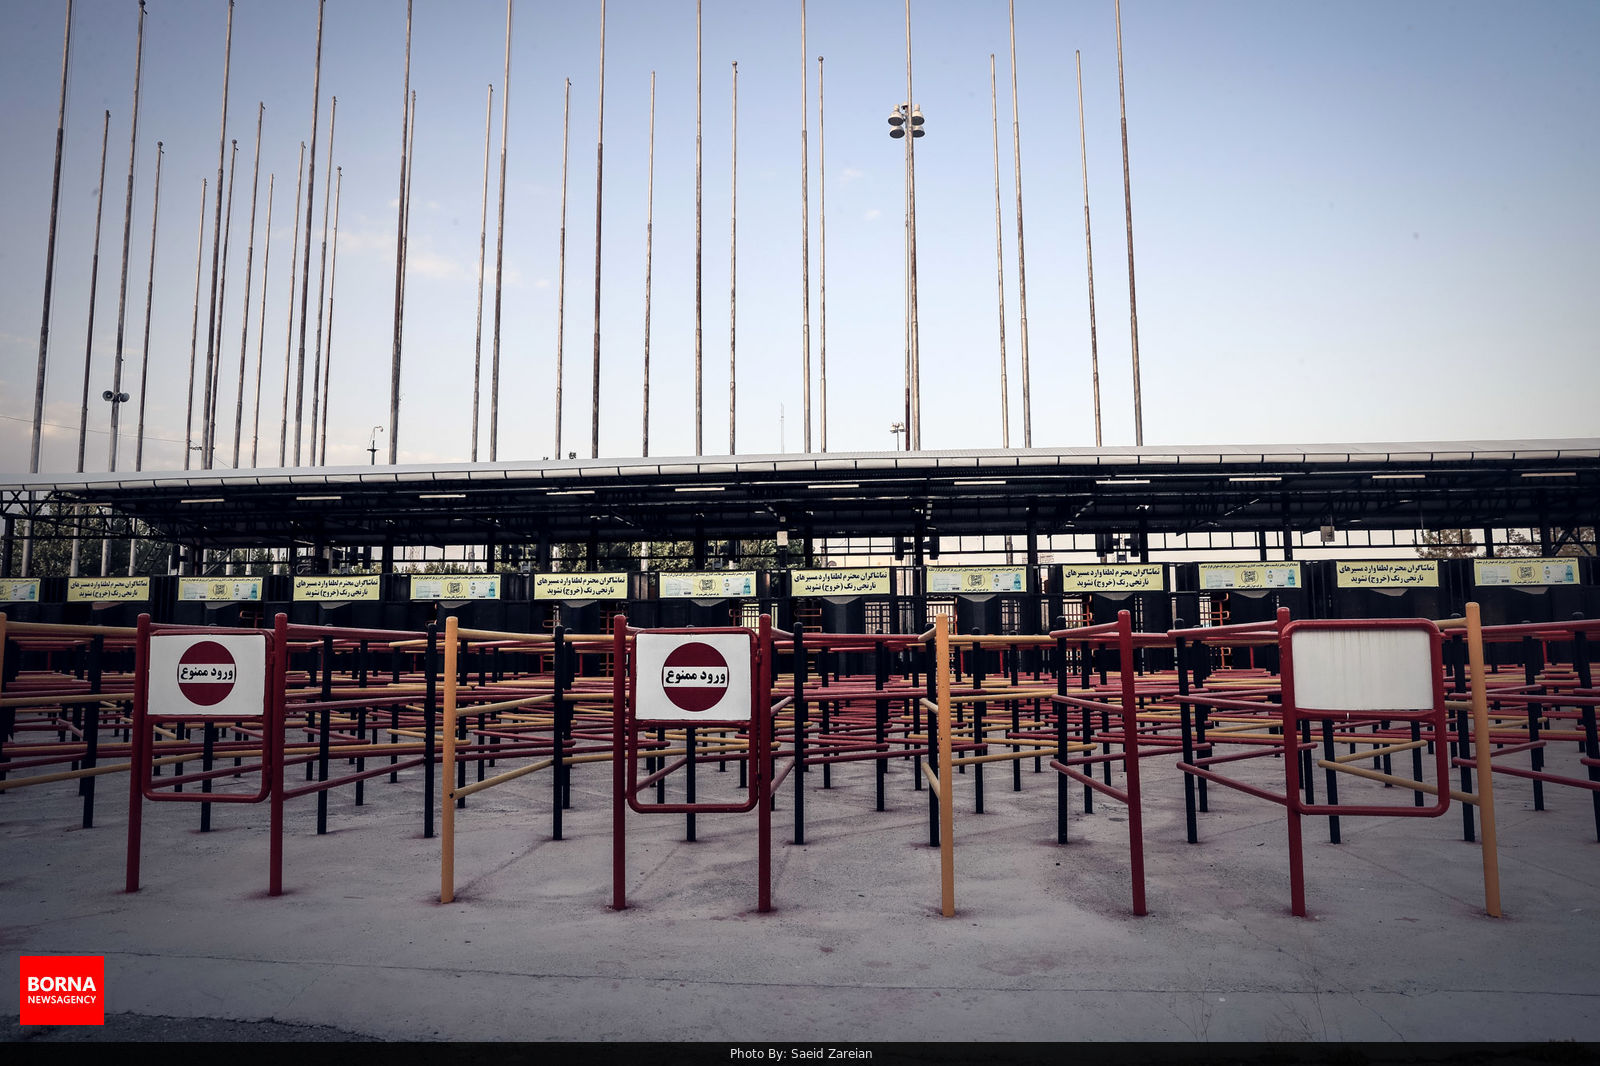 استادیوم آزادی بدون تماشاگر + عکس